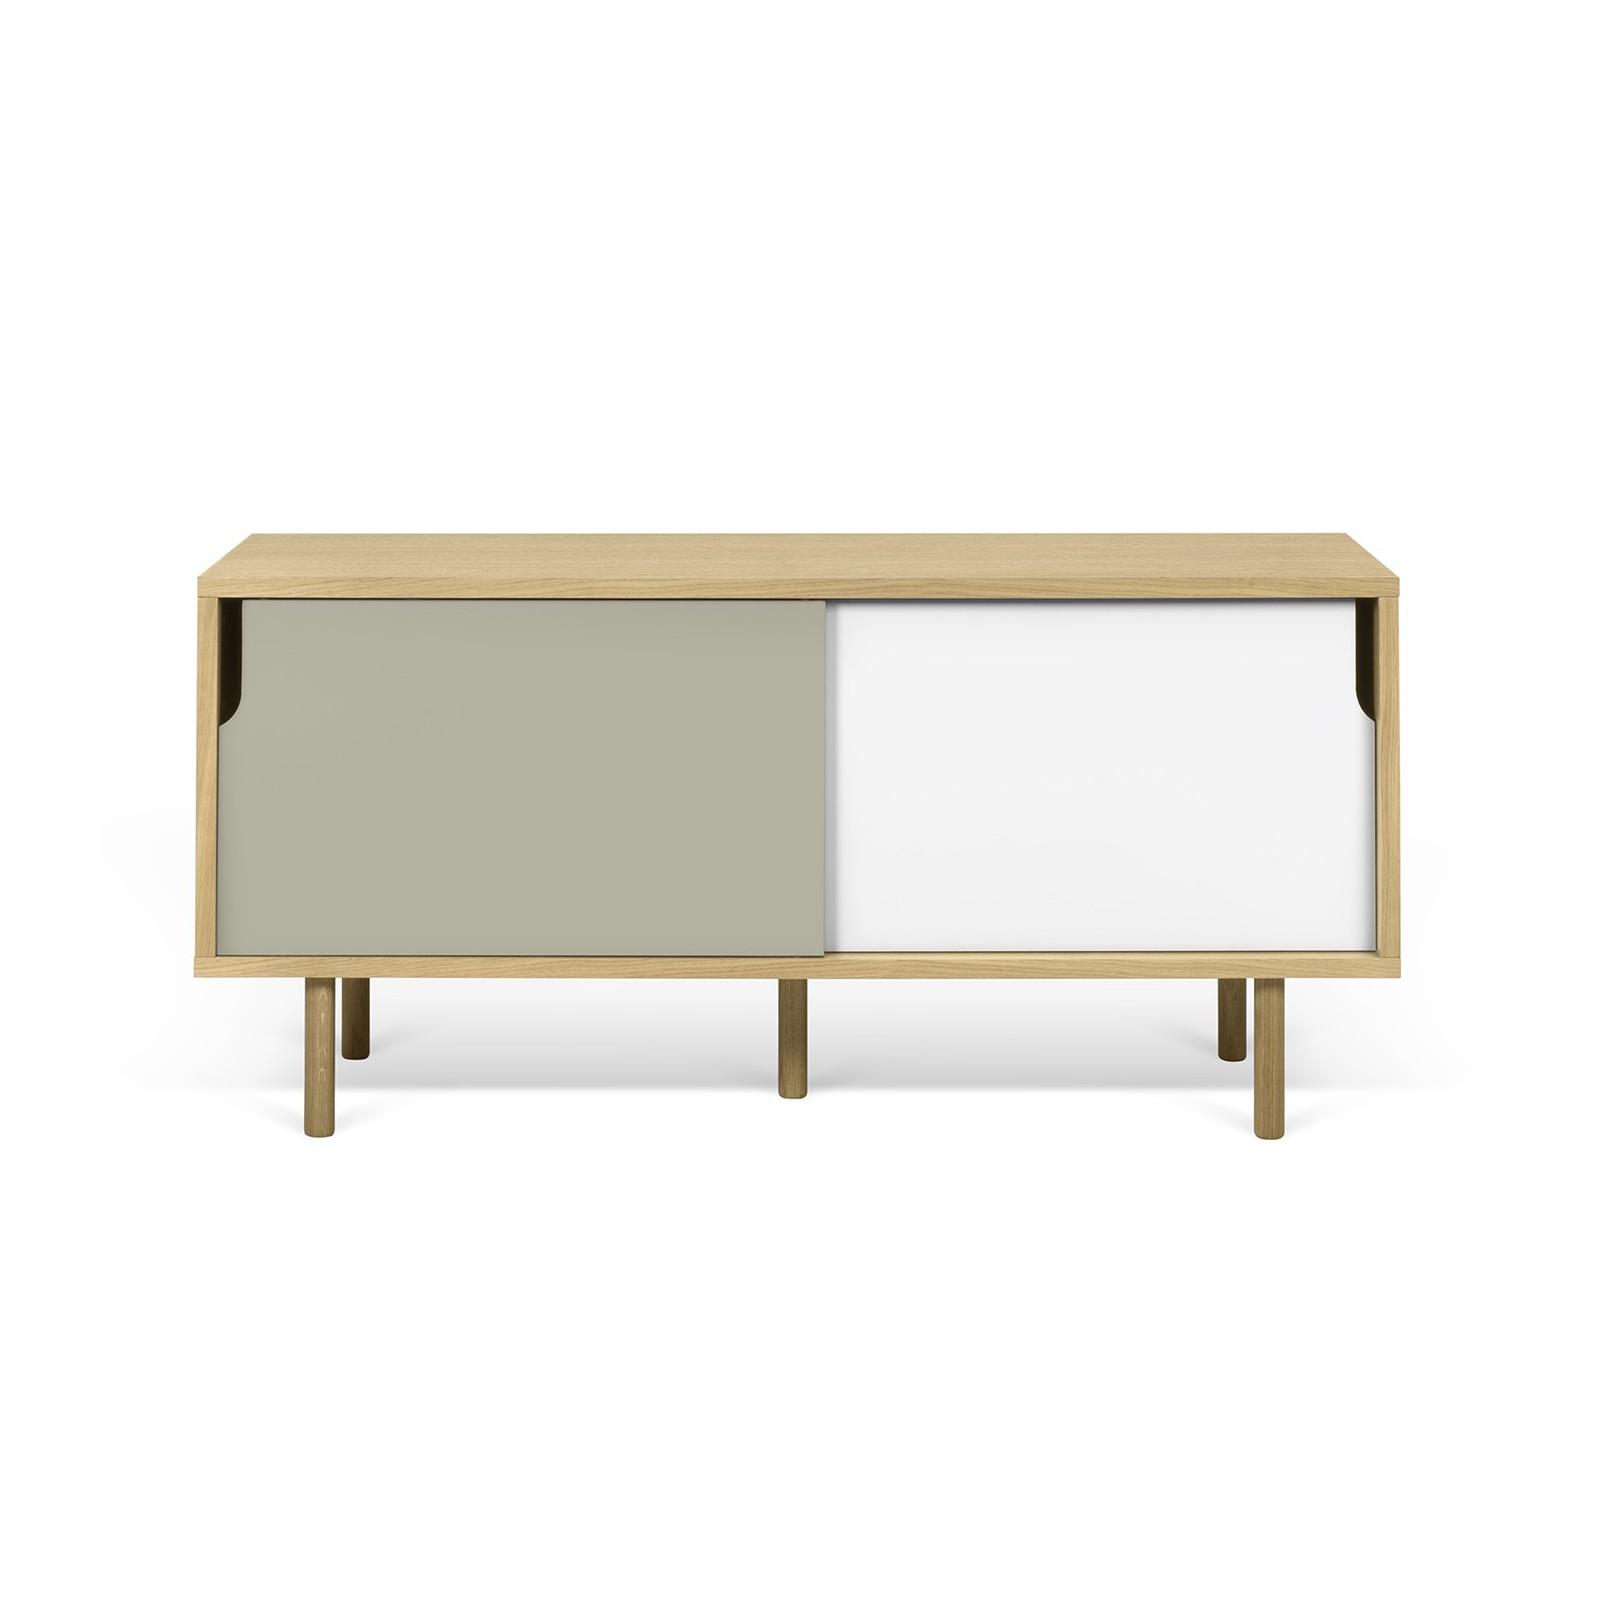 meuble tv danois blanc et gris arne concept. Black Bedroom Furniture Sets. Home Design Ideas